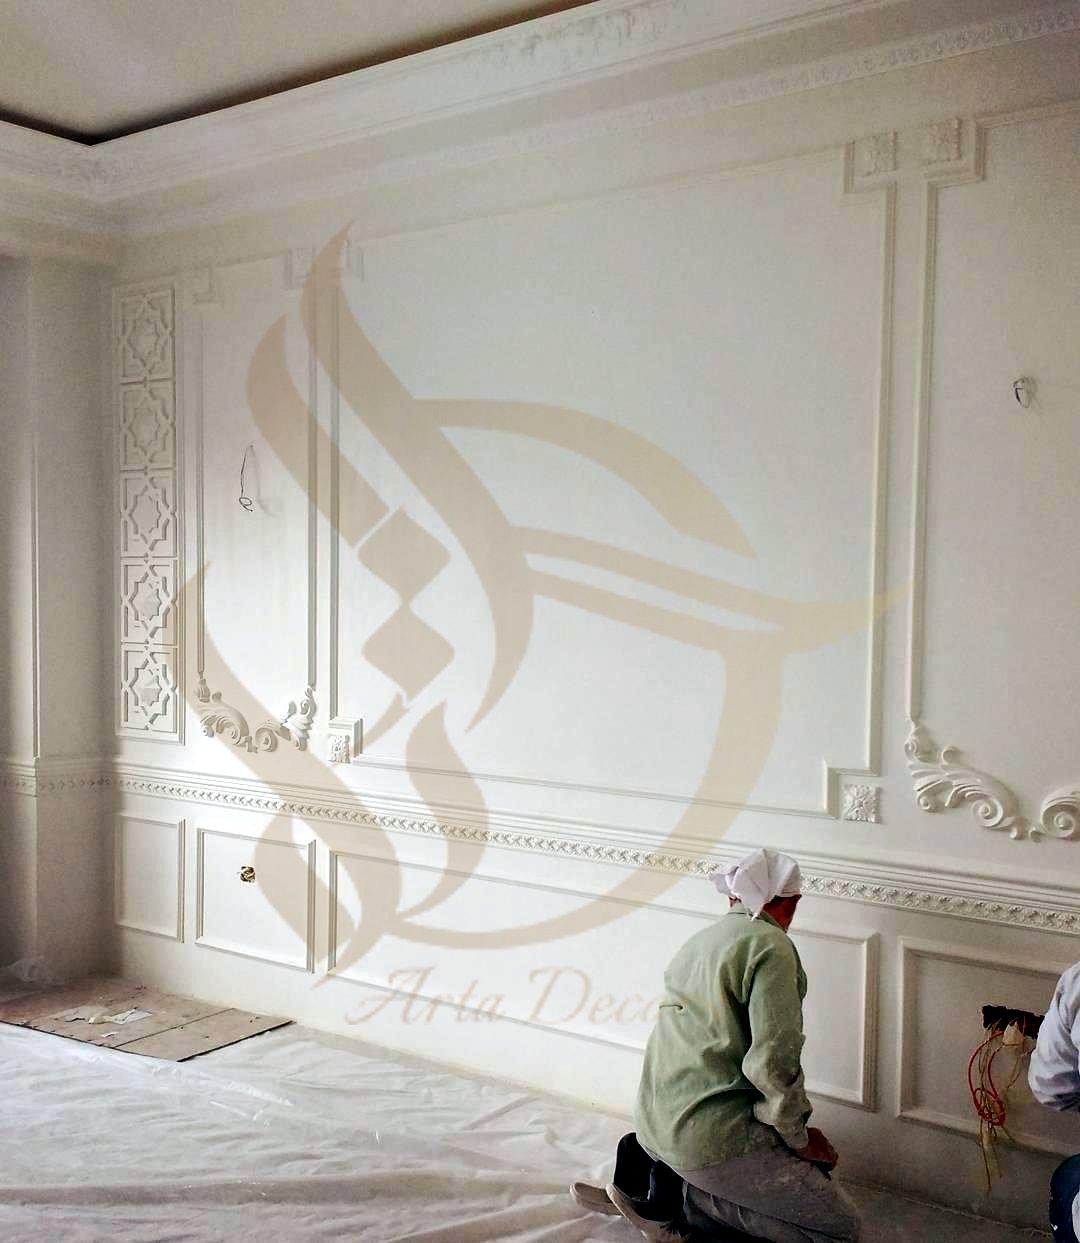 پروژه یارمحمدی ۸